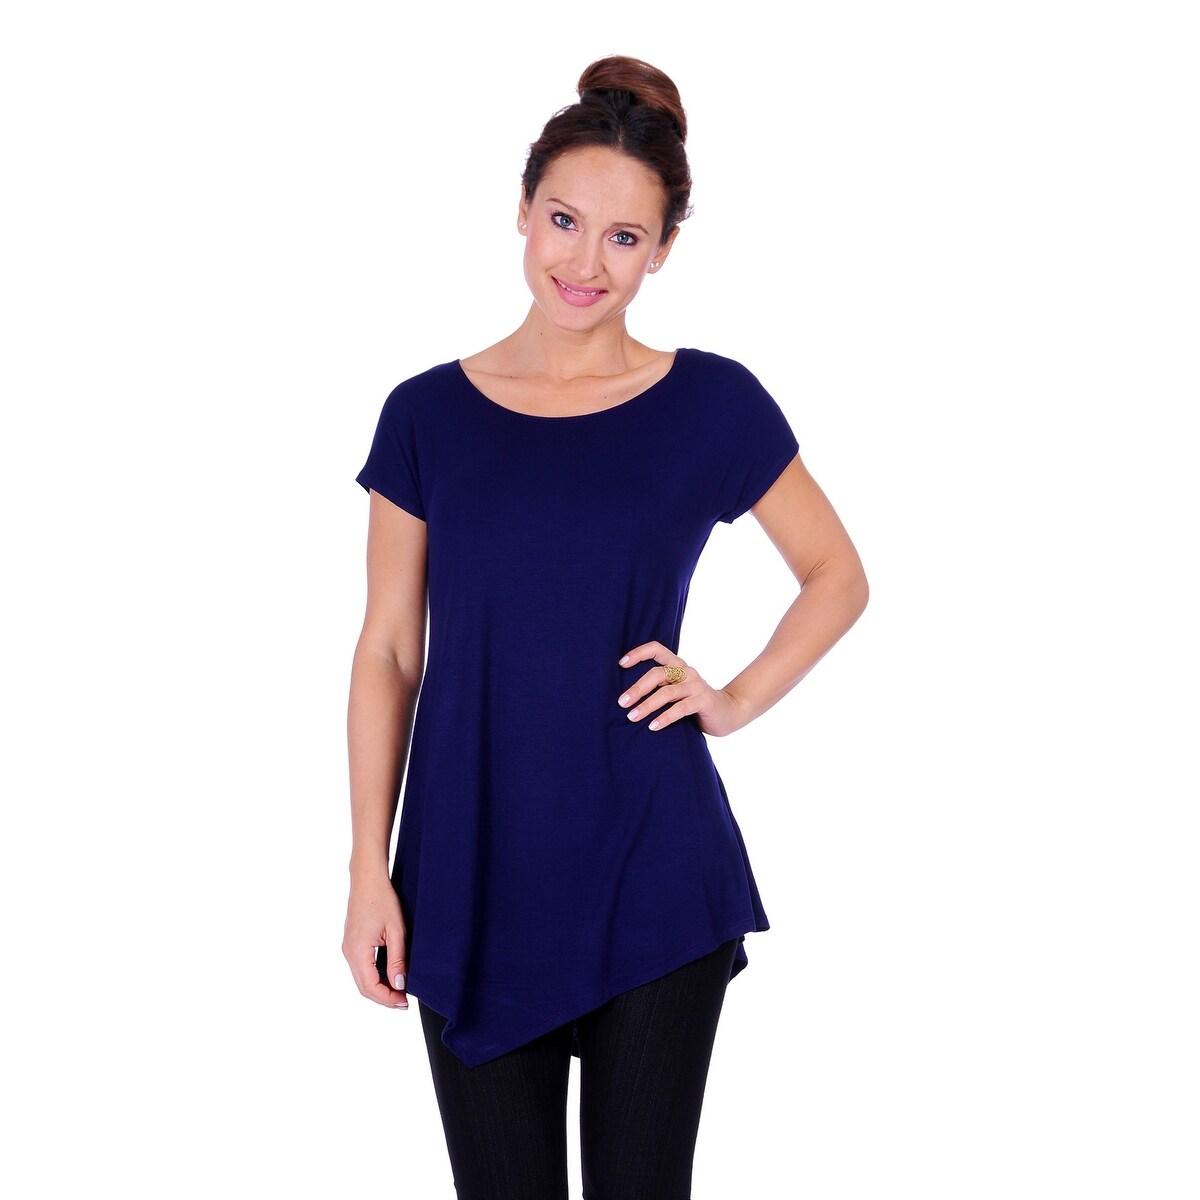 Simply Ravishing Women's Assymetrical Front/Back Handkerchief Hem Sleeveless Tunic Top - Thumbnail 10